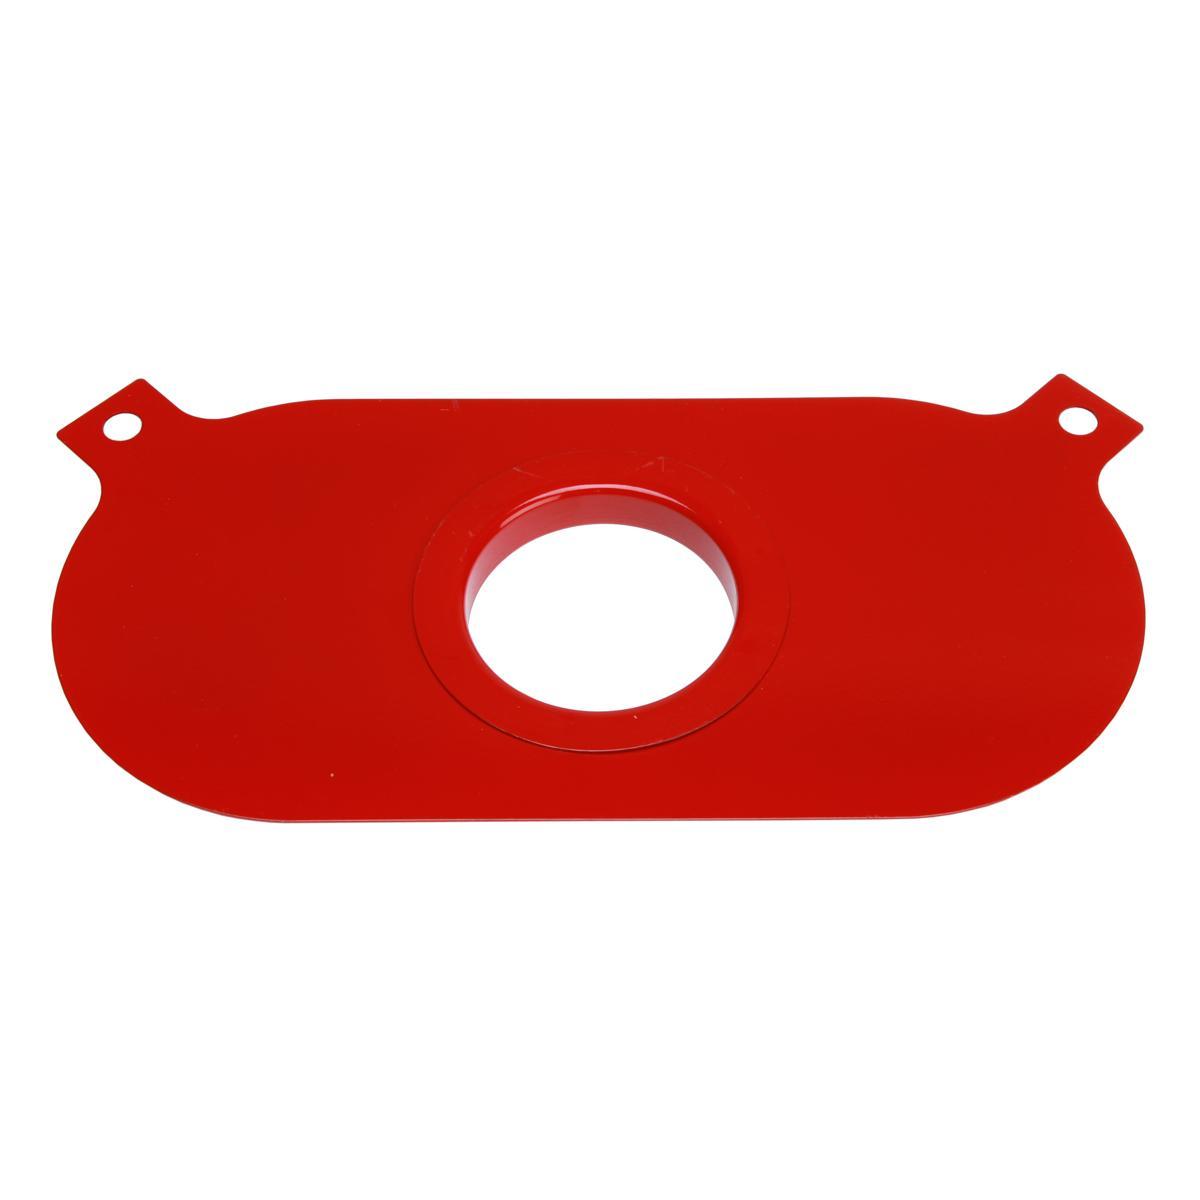 Itg jc30 baseplate 3jc30 from merlin motorsport for Motor base plate design